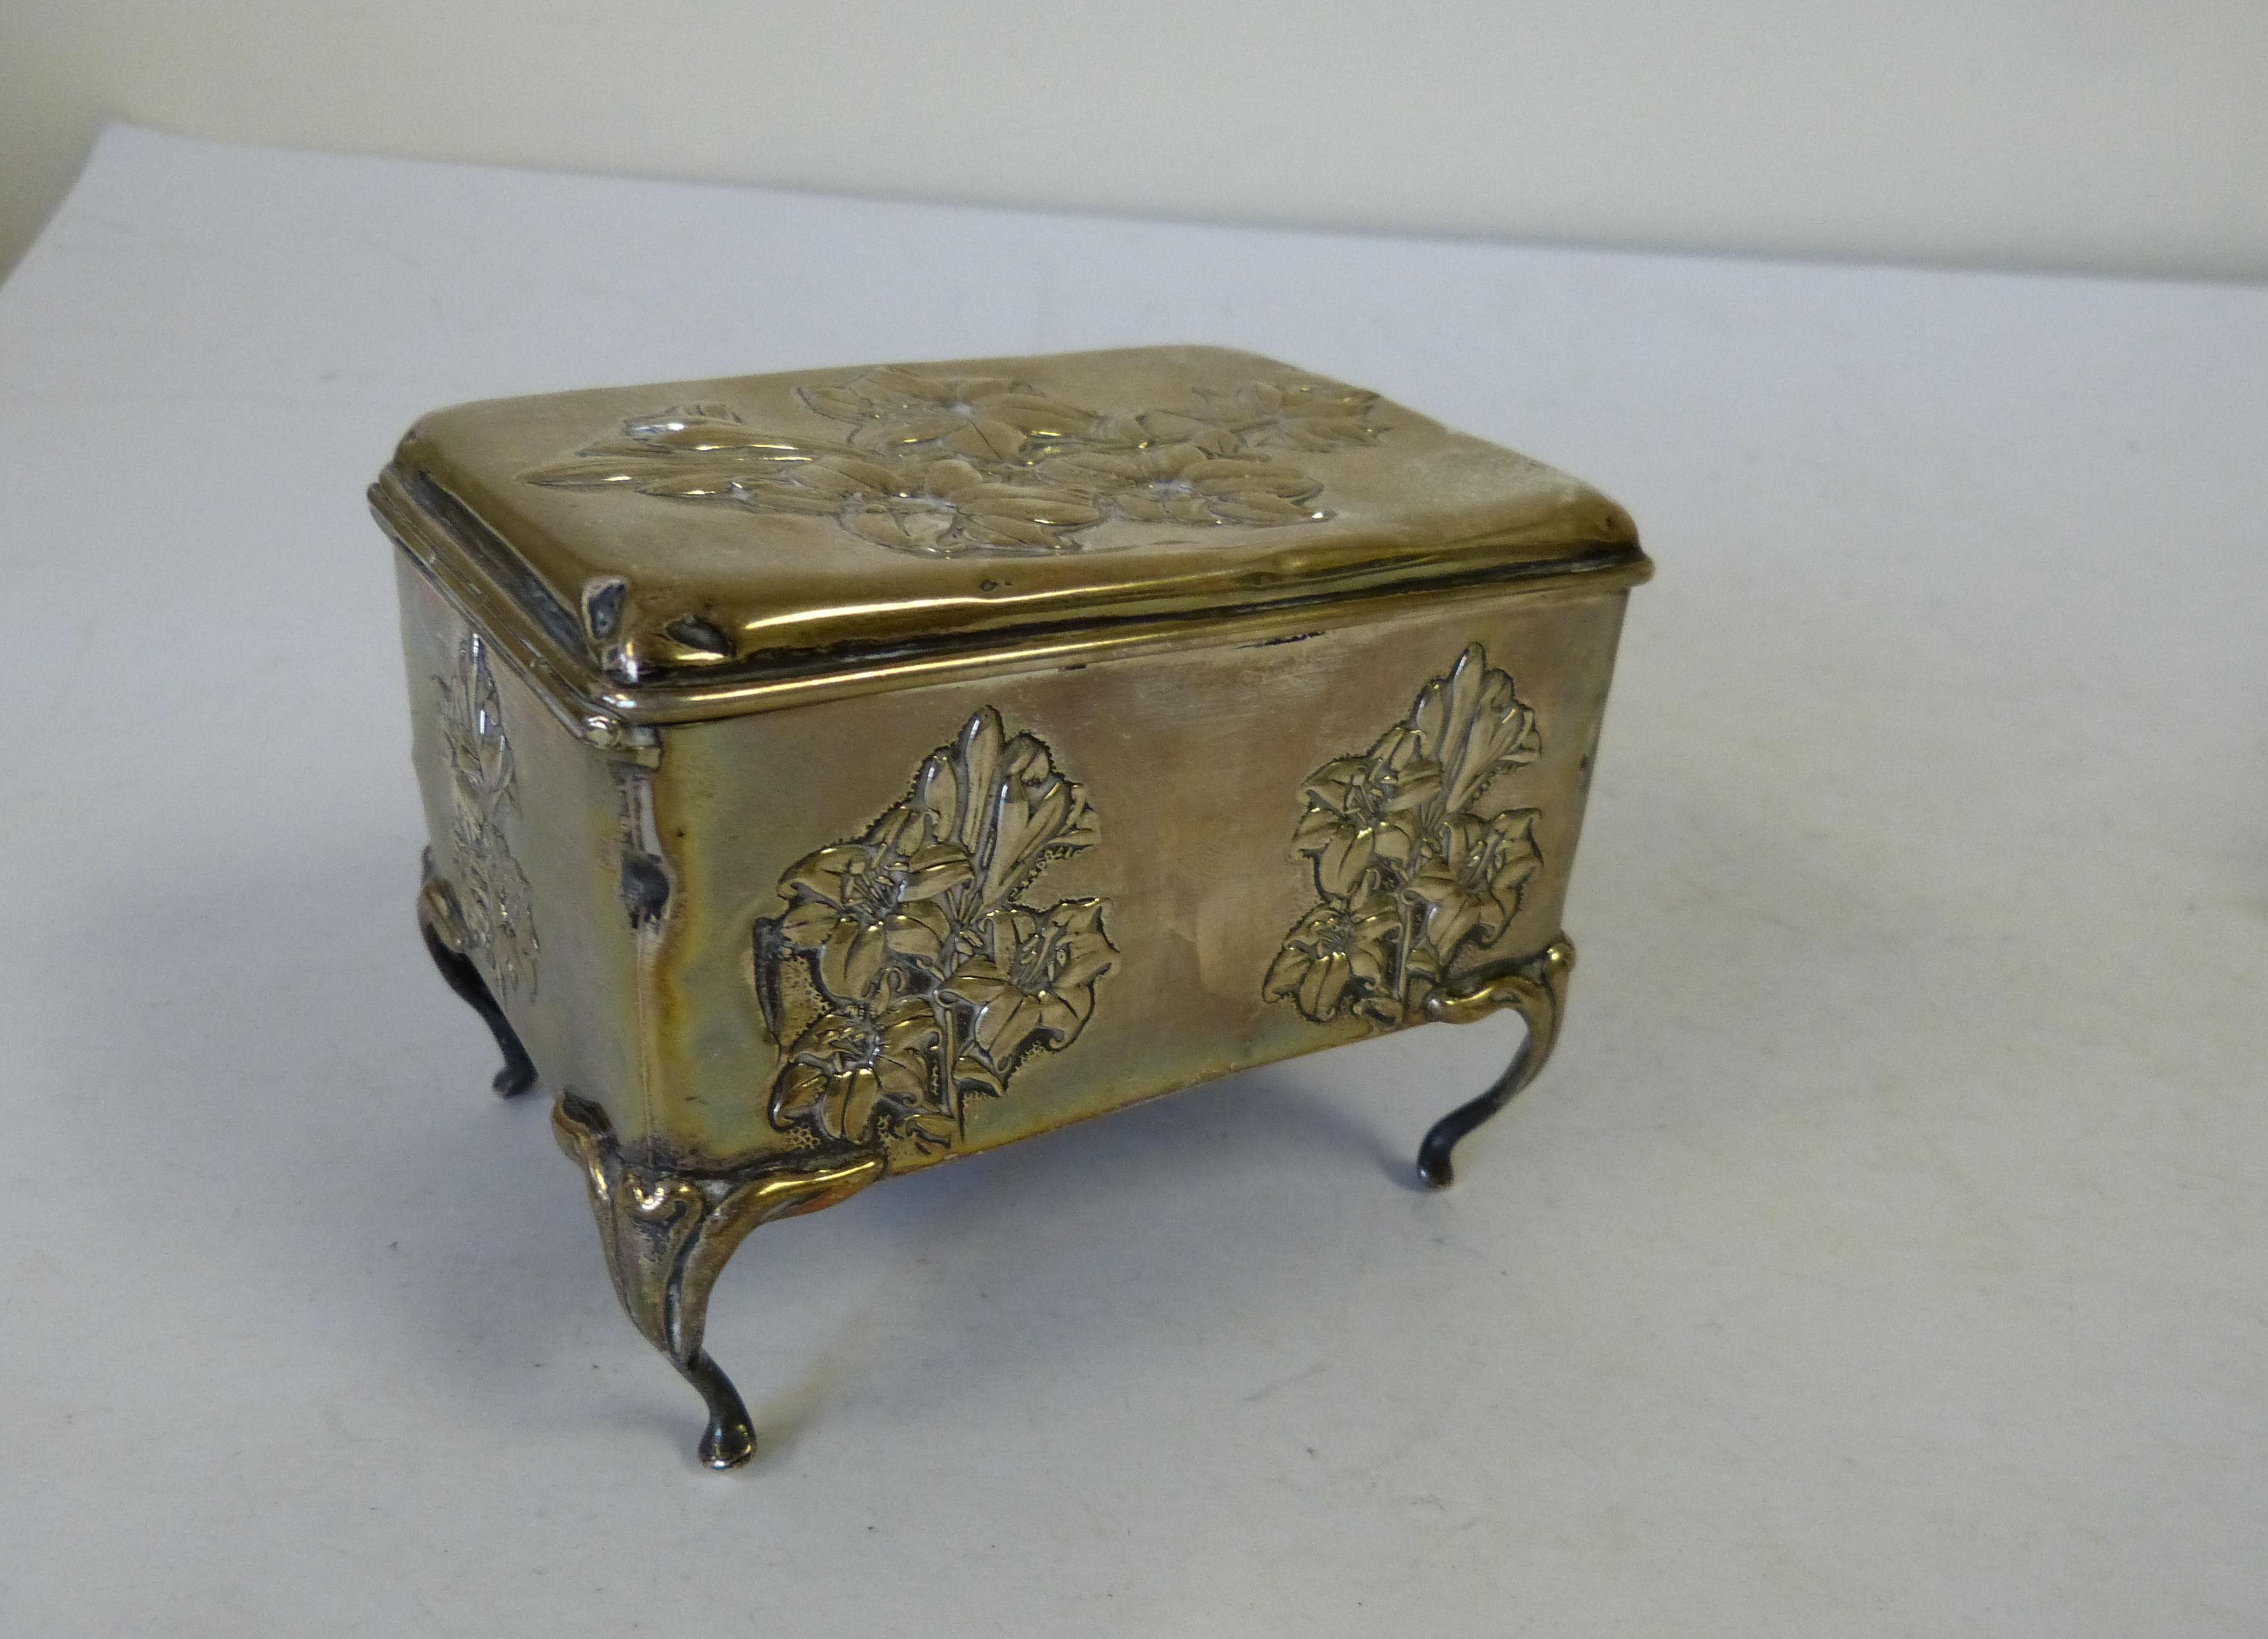 A Birmingham Silver Rectangular Trinket Box having all over embossed floral and leaf decoration